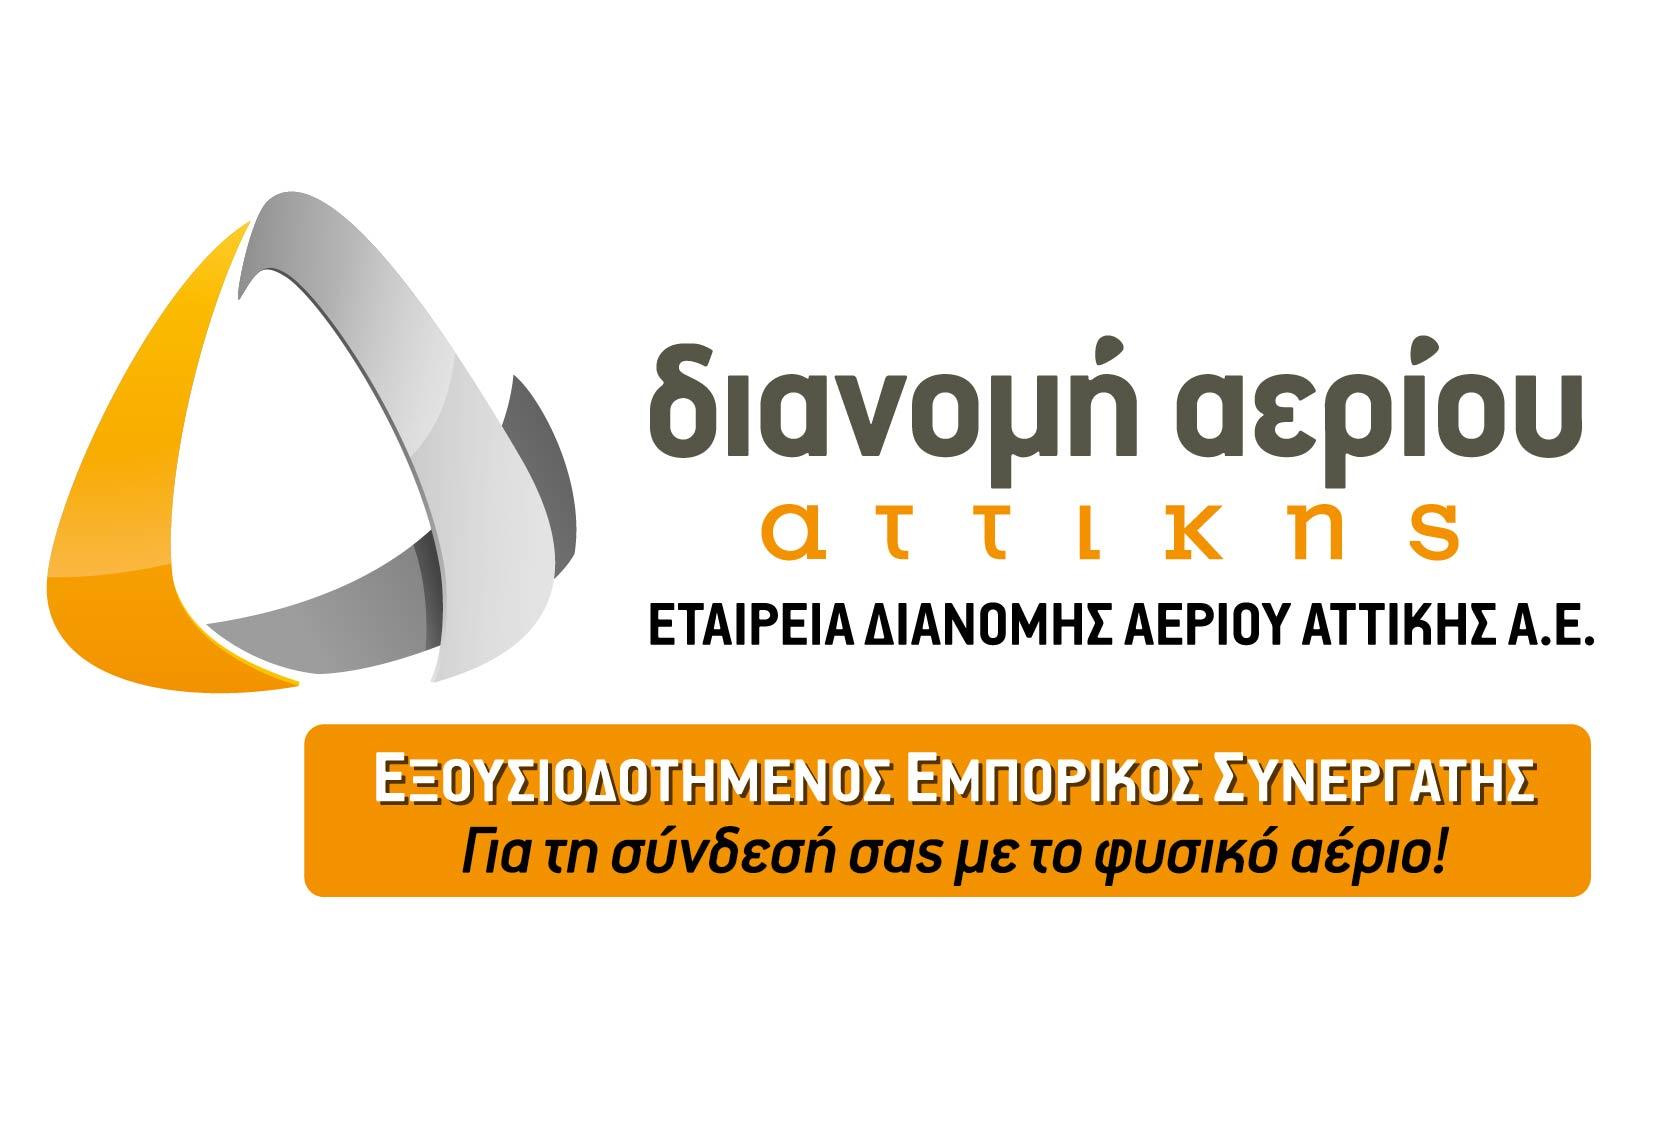 edaa logo authorized dealers small